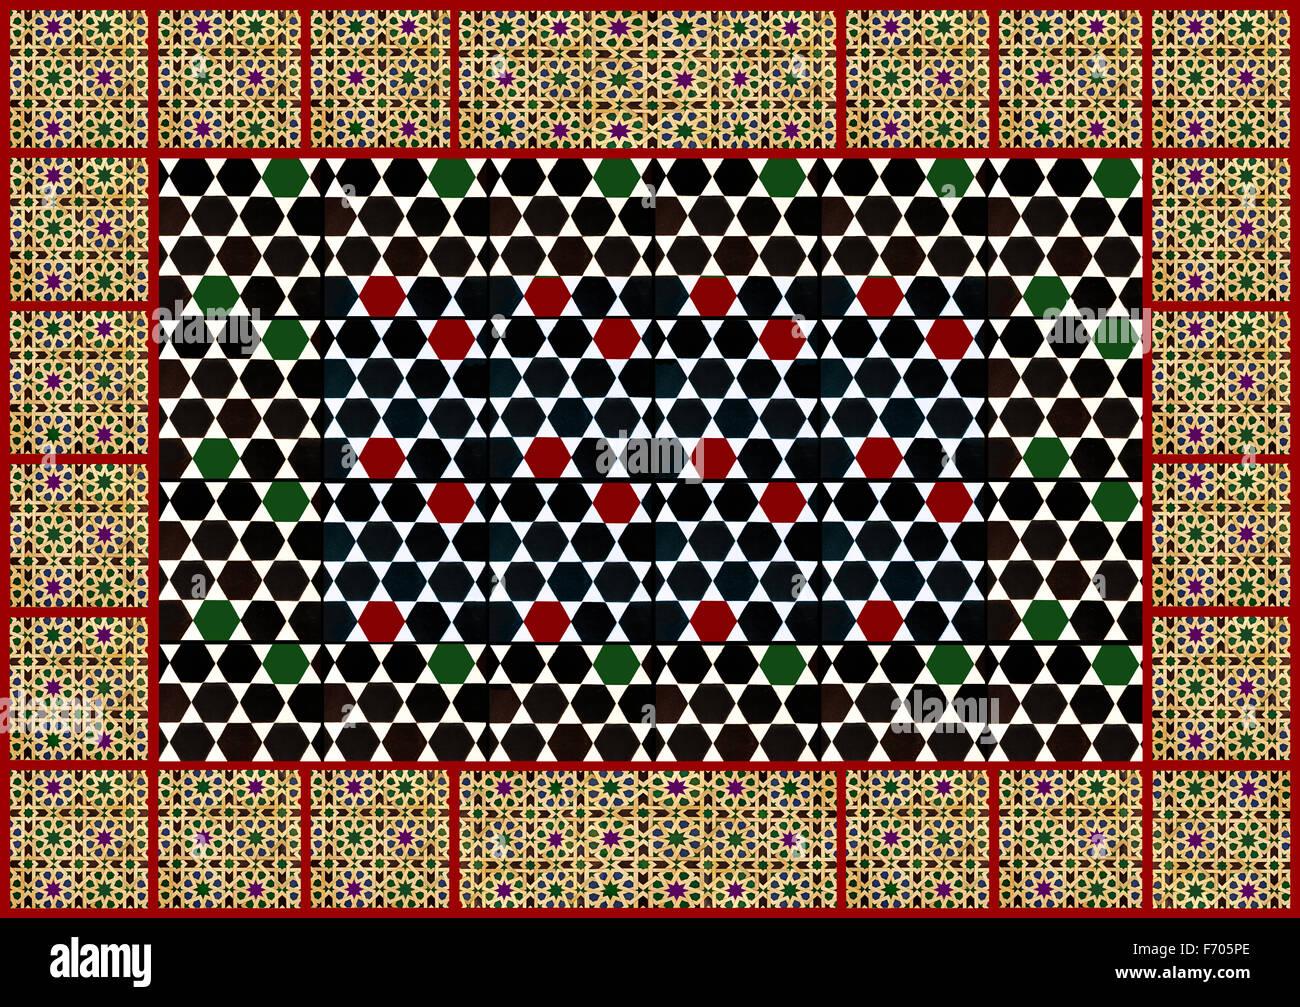 Moorish geometric design wall tiles - collage - Stock Image